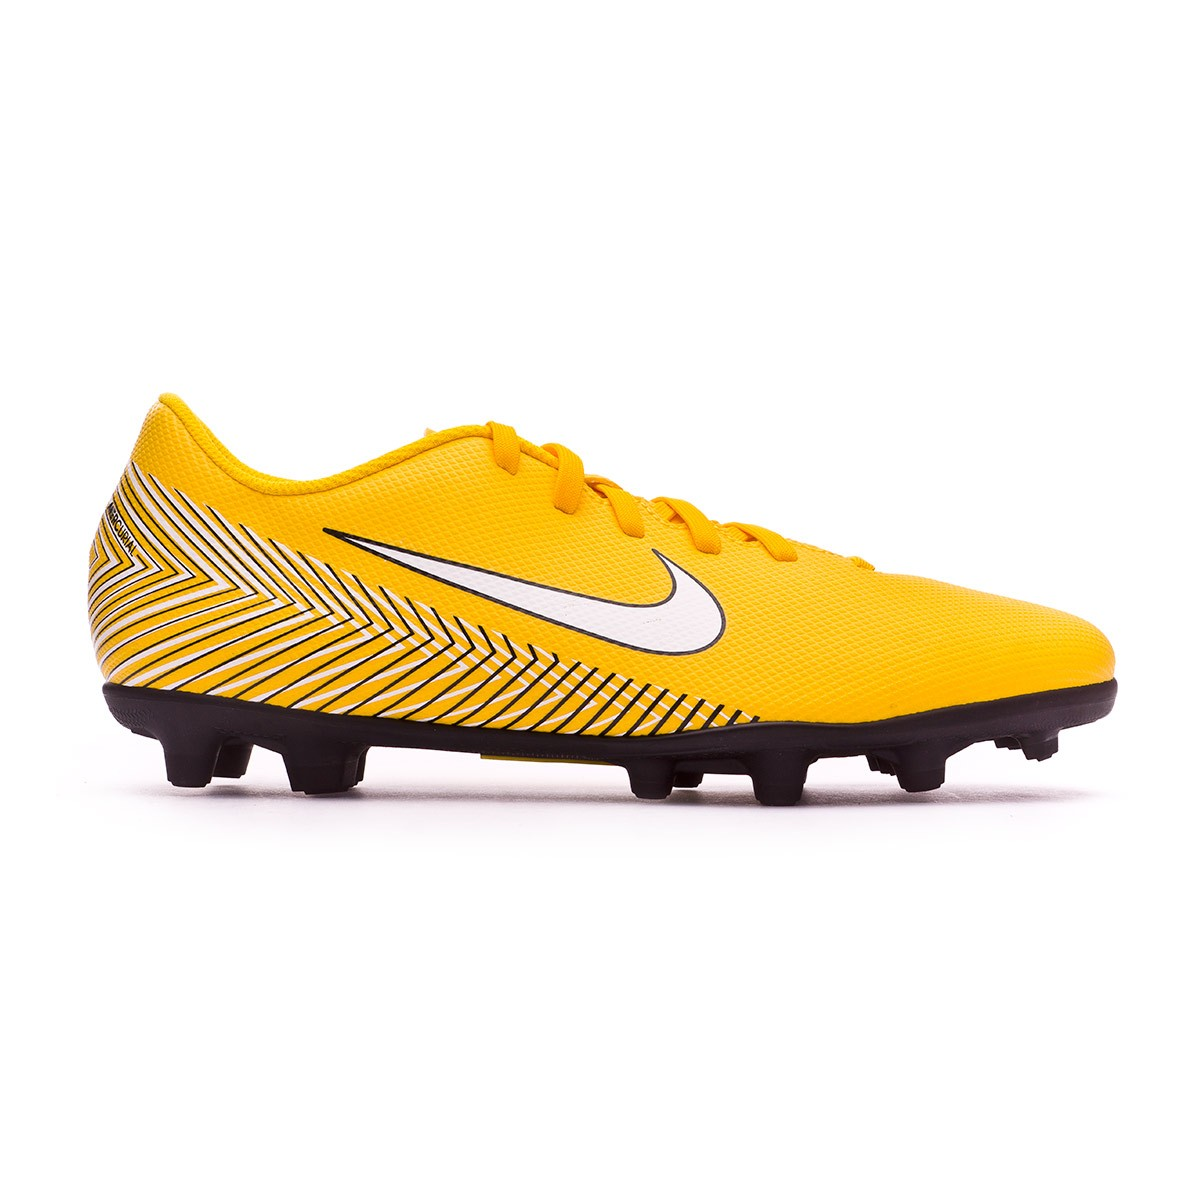 Zapatos de fútbol Nike Mercurial Vapor XII Club MG Neymar Yellow-Black -  Soloporteros es ahora Fútbol Emotion 45c91f5eea18a